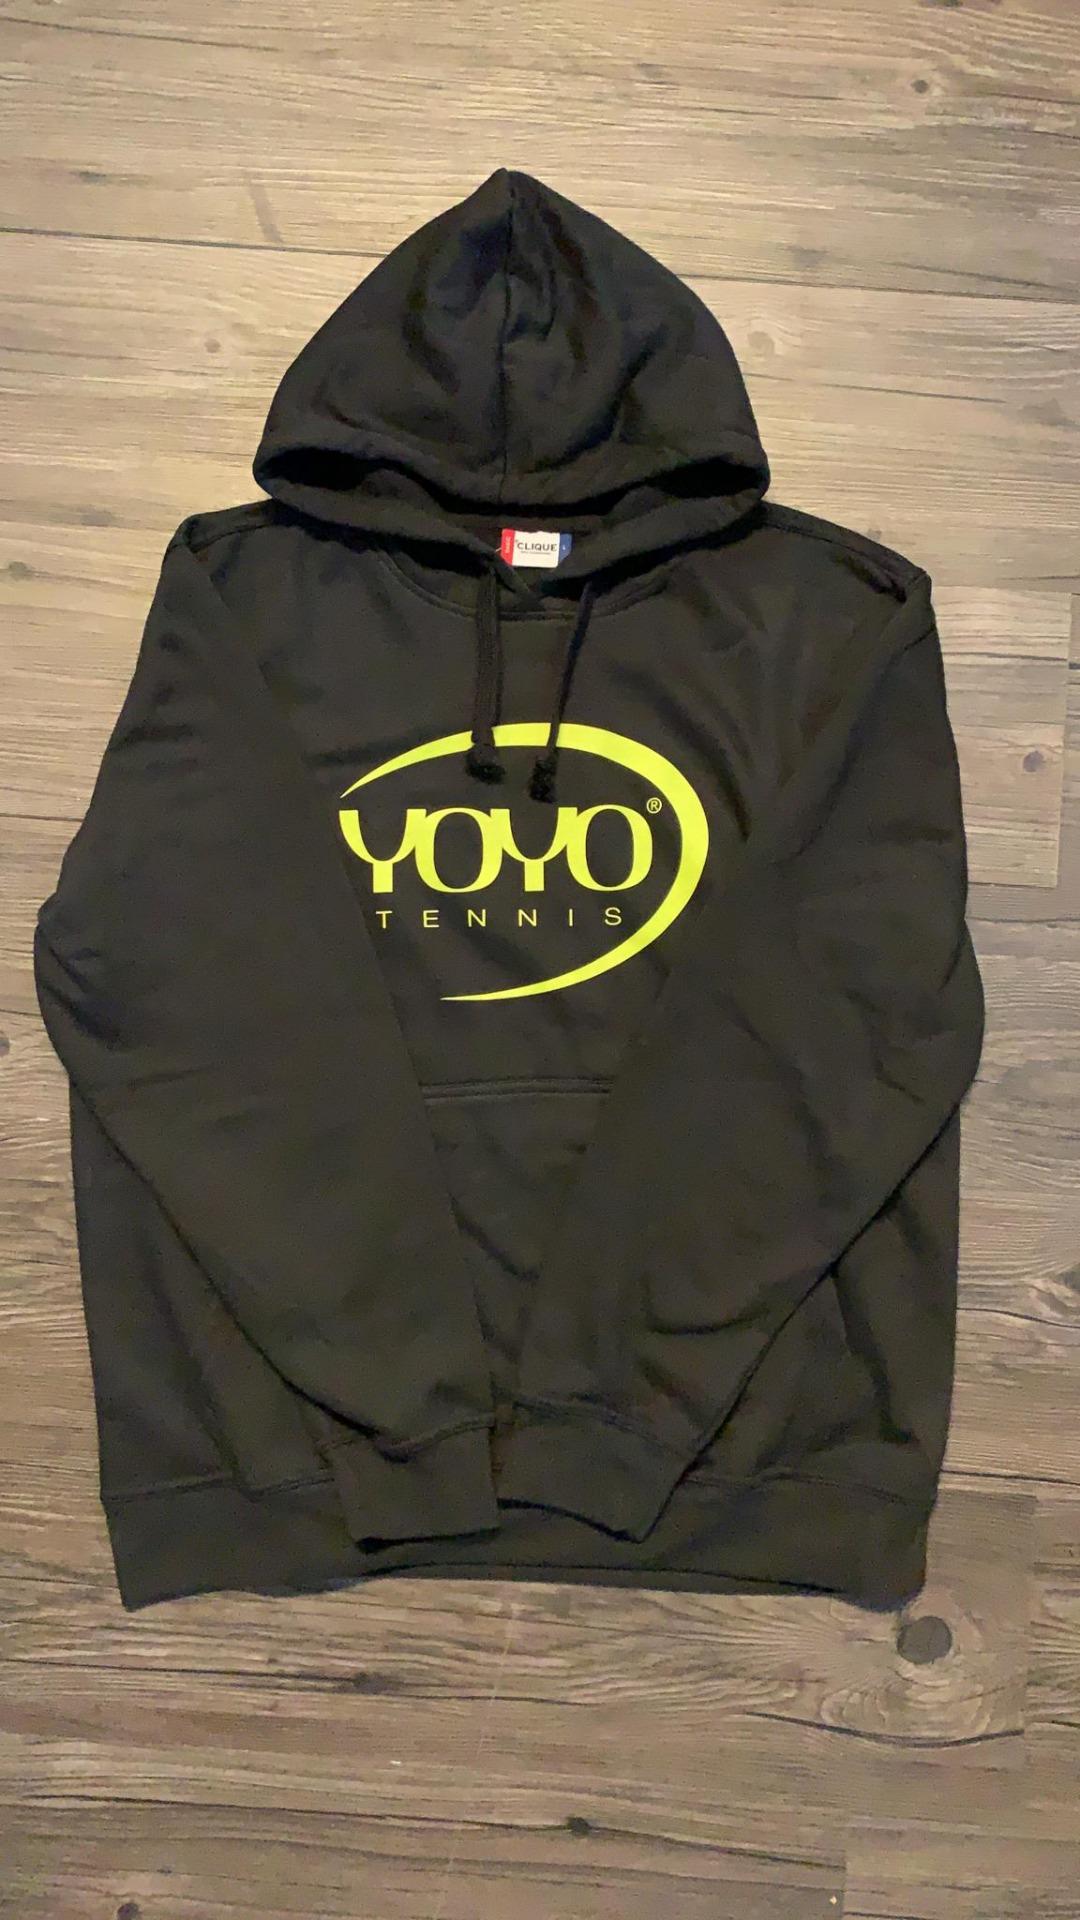 YOYO-TENNIS Hoody Nero con Logo Giallo